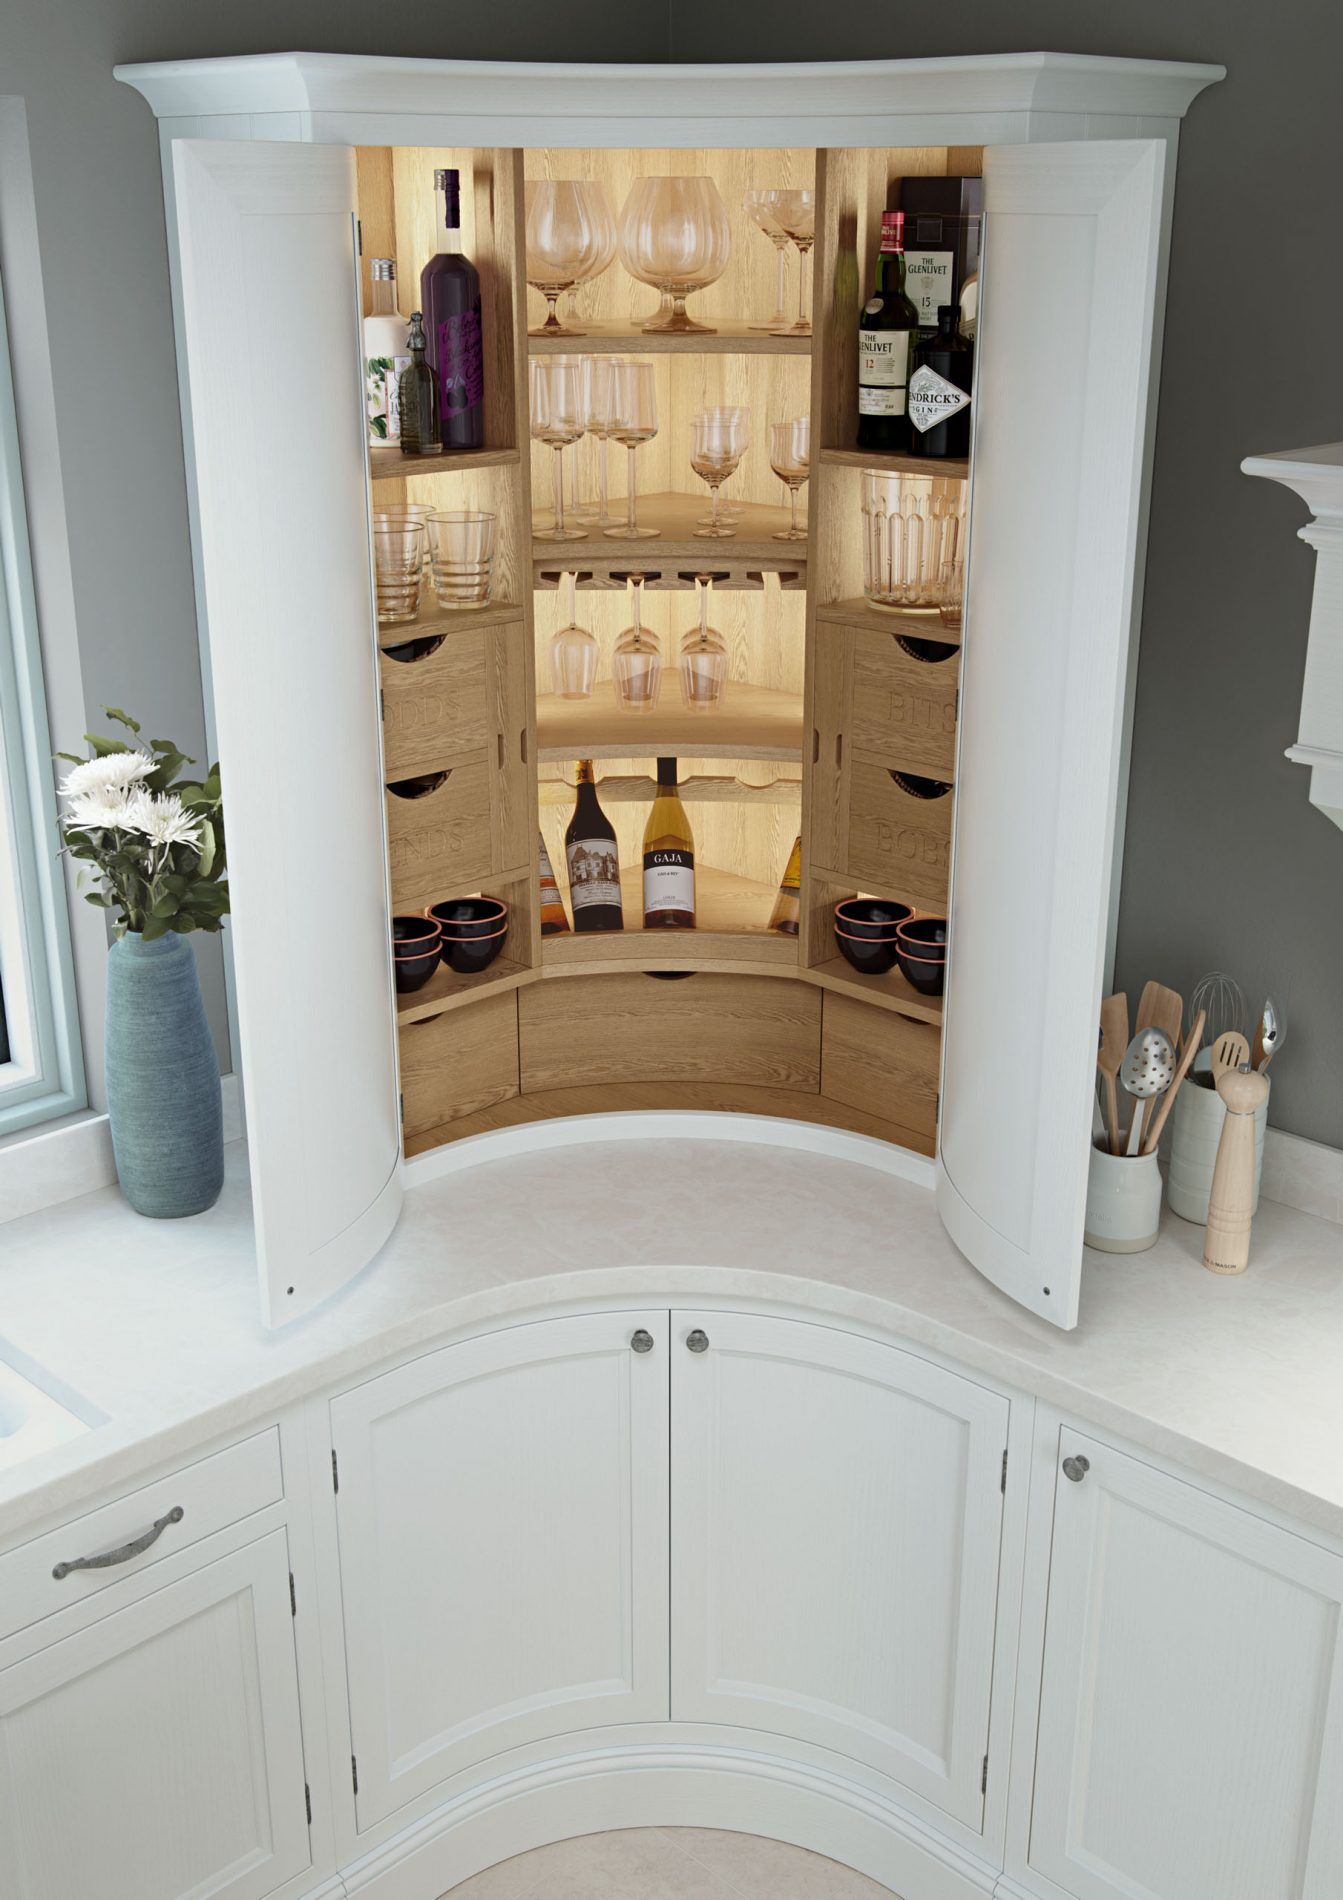 Osbourne Kitchen at Crestwood of Lymington